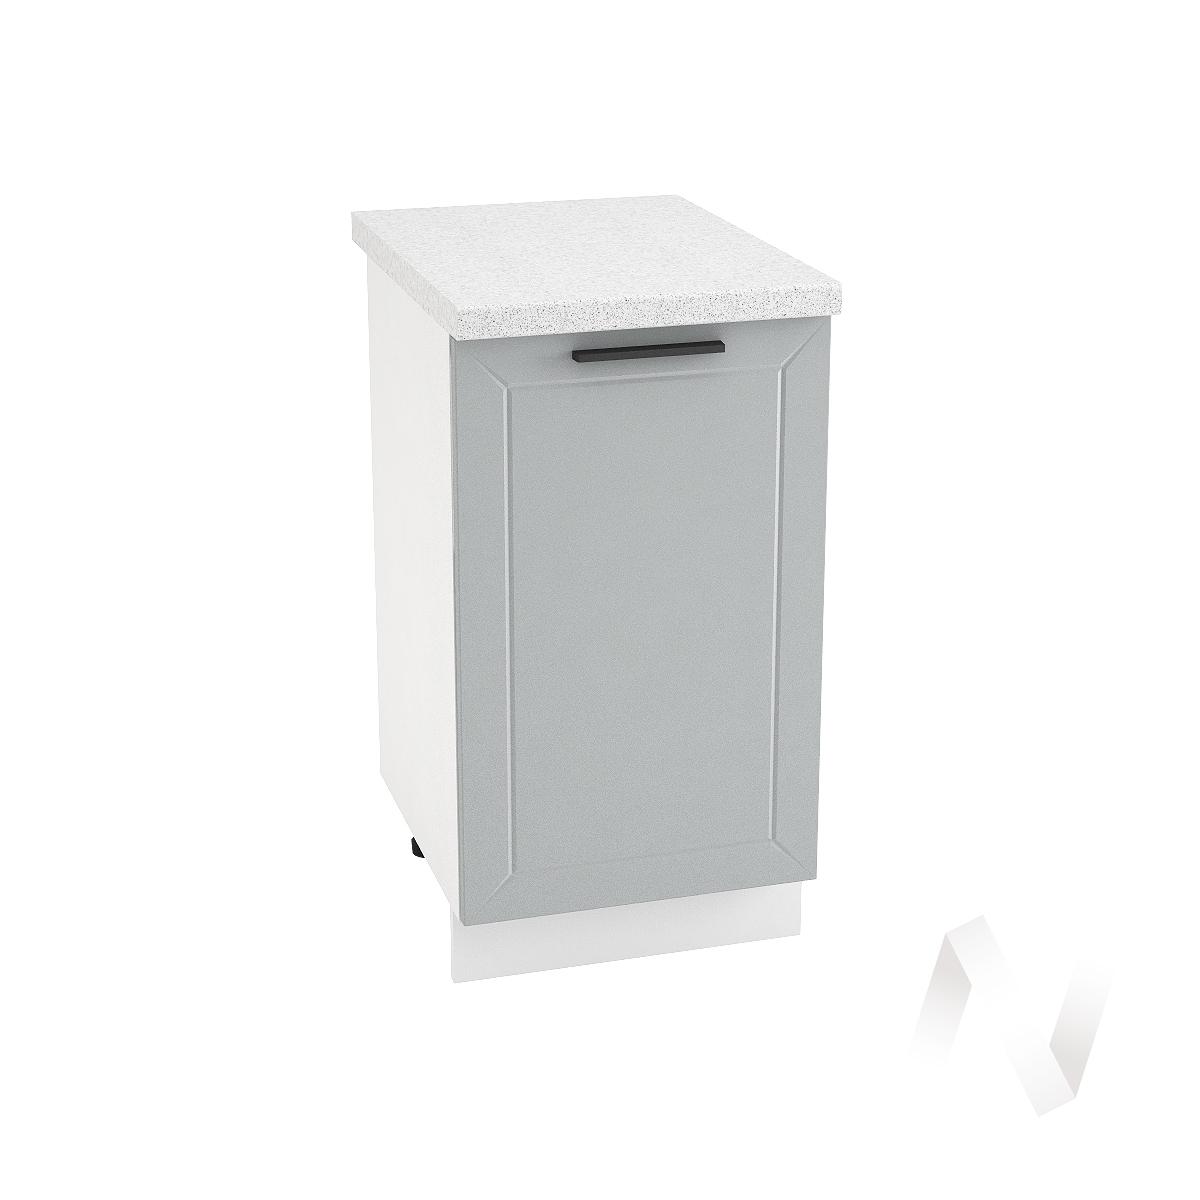 "Кухня ""Глетчер"": Шкаф нижний 450, ШН 450 (Гейнсборо силк/корпус белый)"